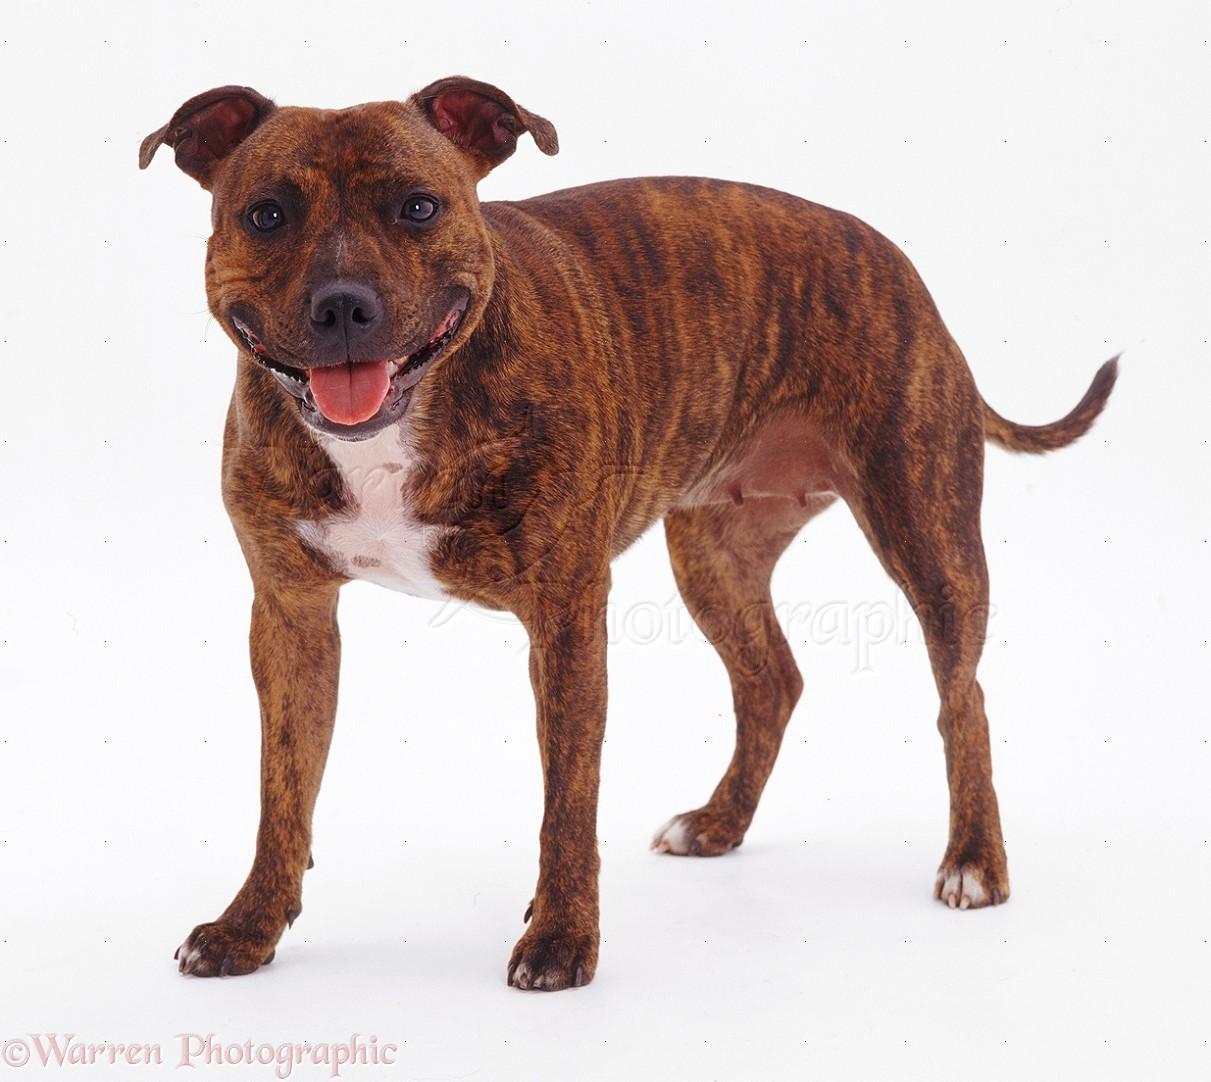 Dog Brindle Staffordshire Bull Terrier Photo Wp07793